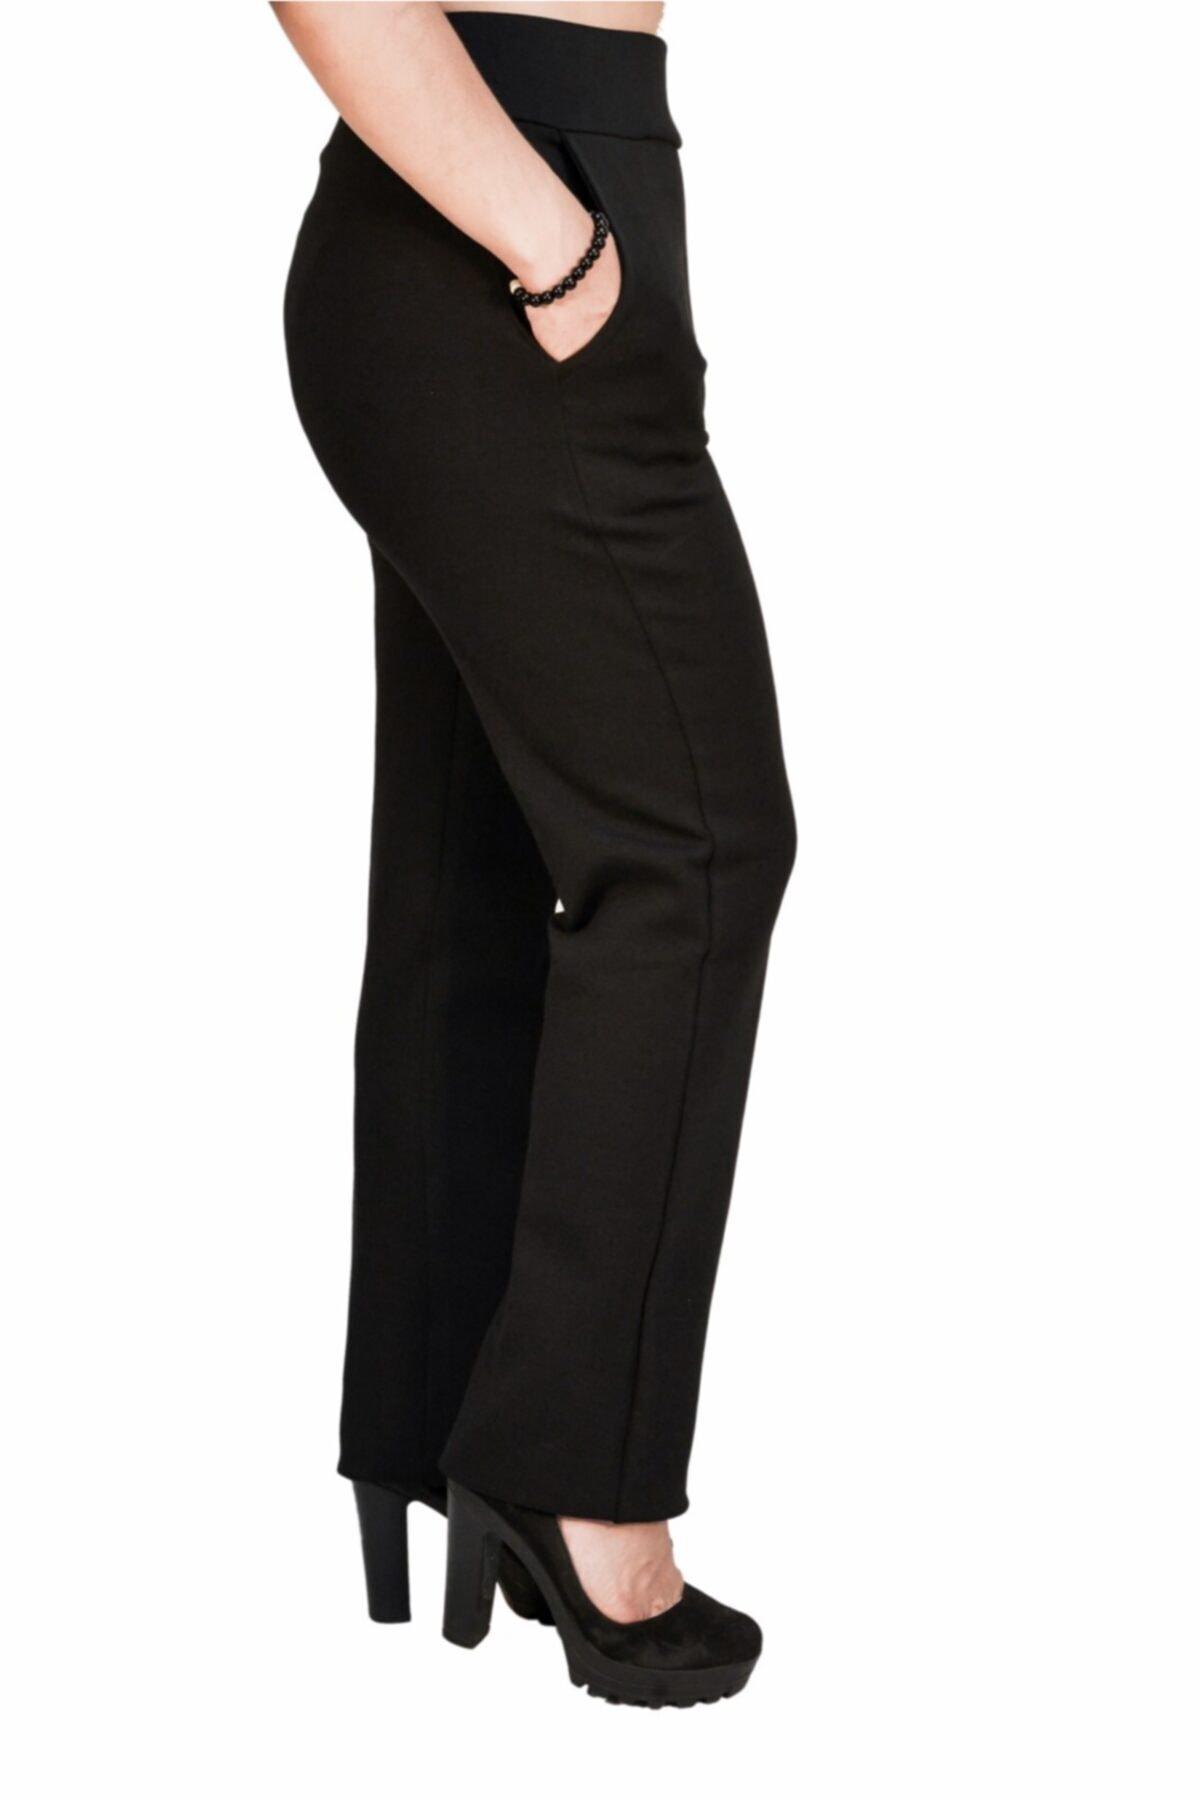 Otto Kadın Siyah Klasik Yüksek Kemer Dar Paça Pantalon 2